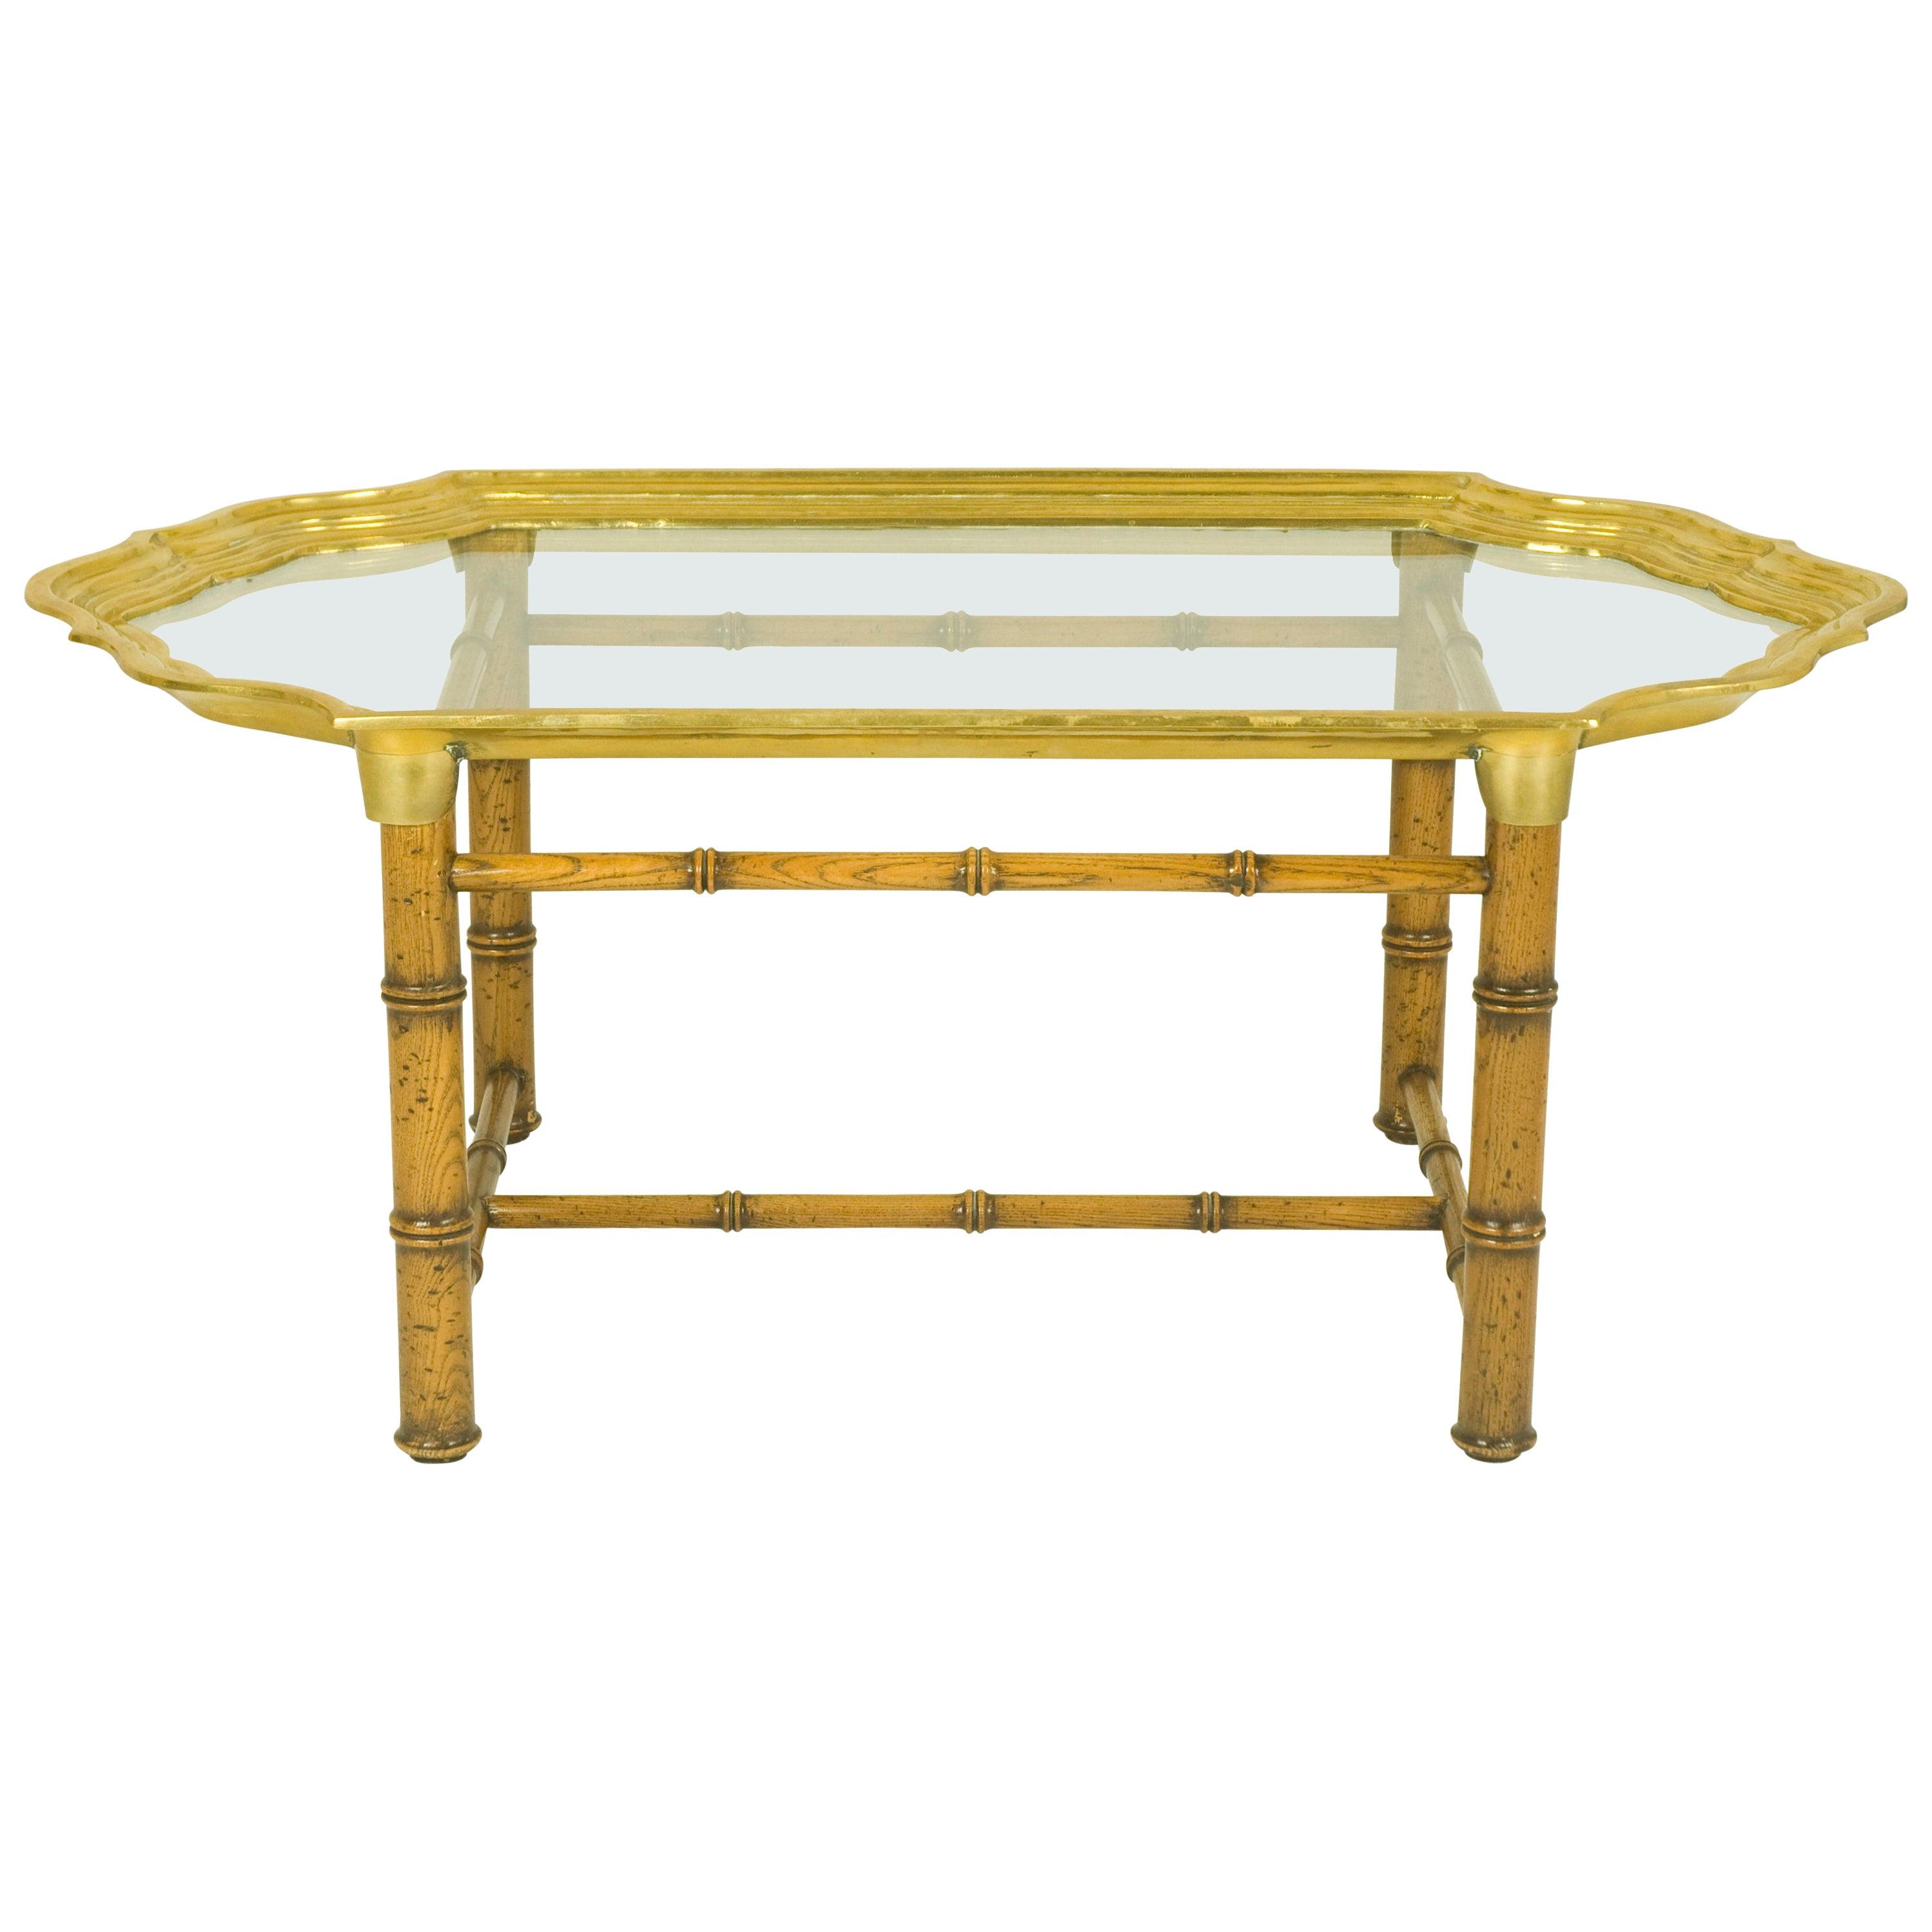 Italian Wood and Brass 1970s Coffee Table